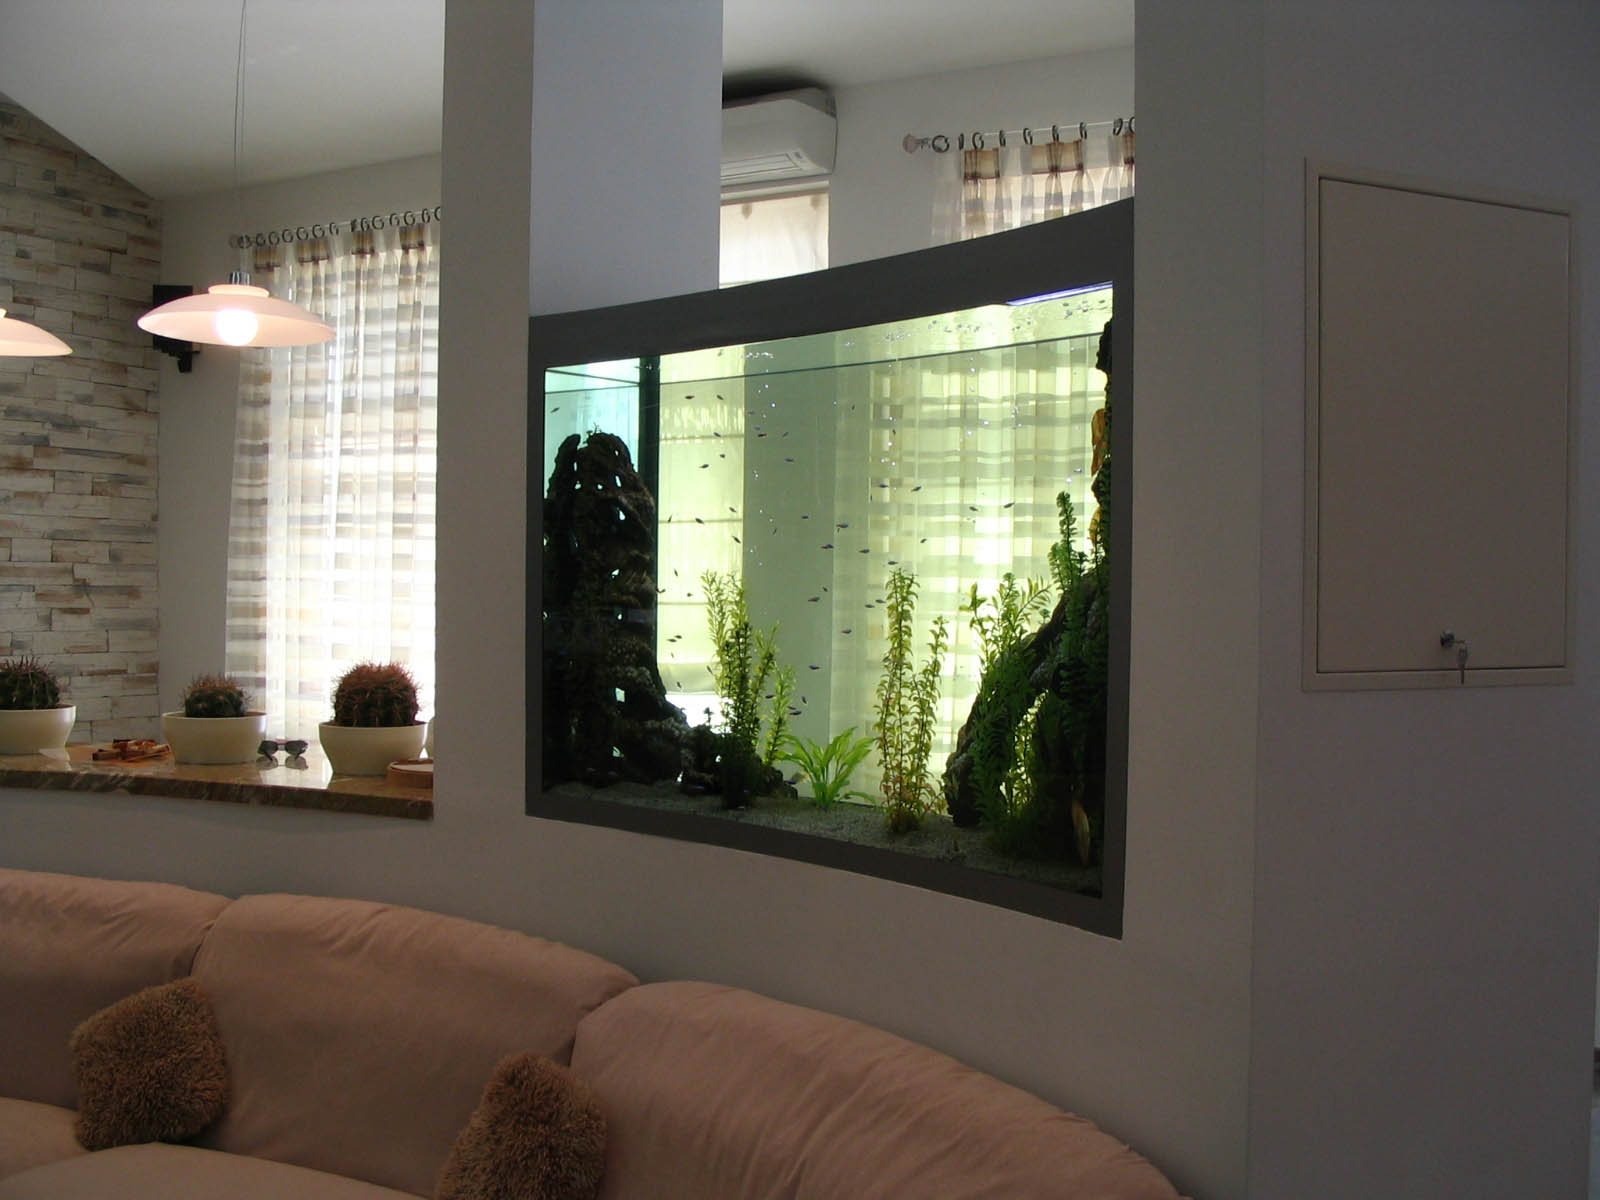 Перегородка в квартире фото с аквариумом